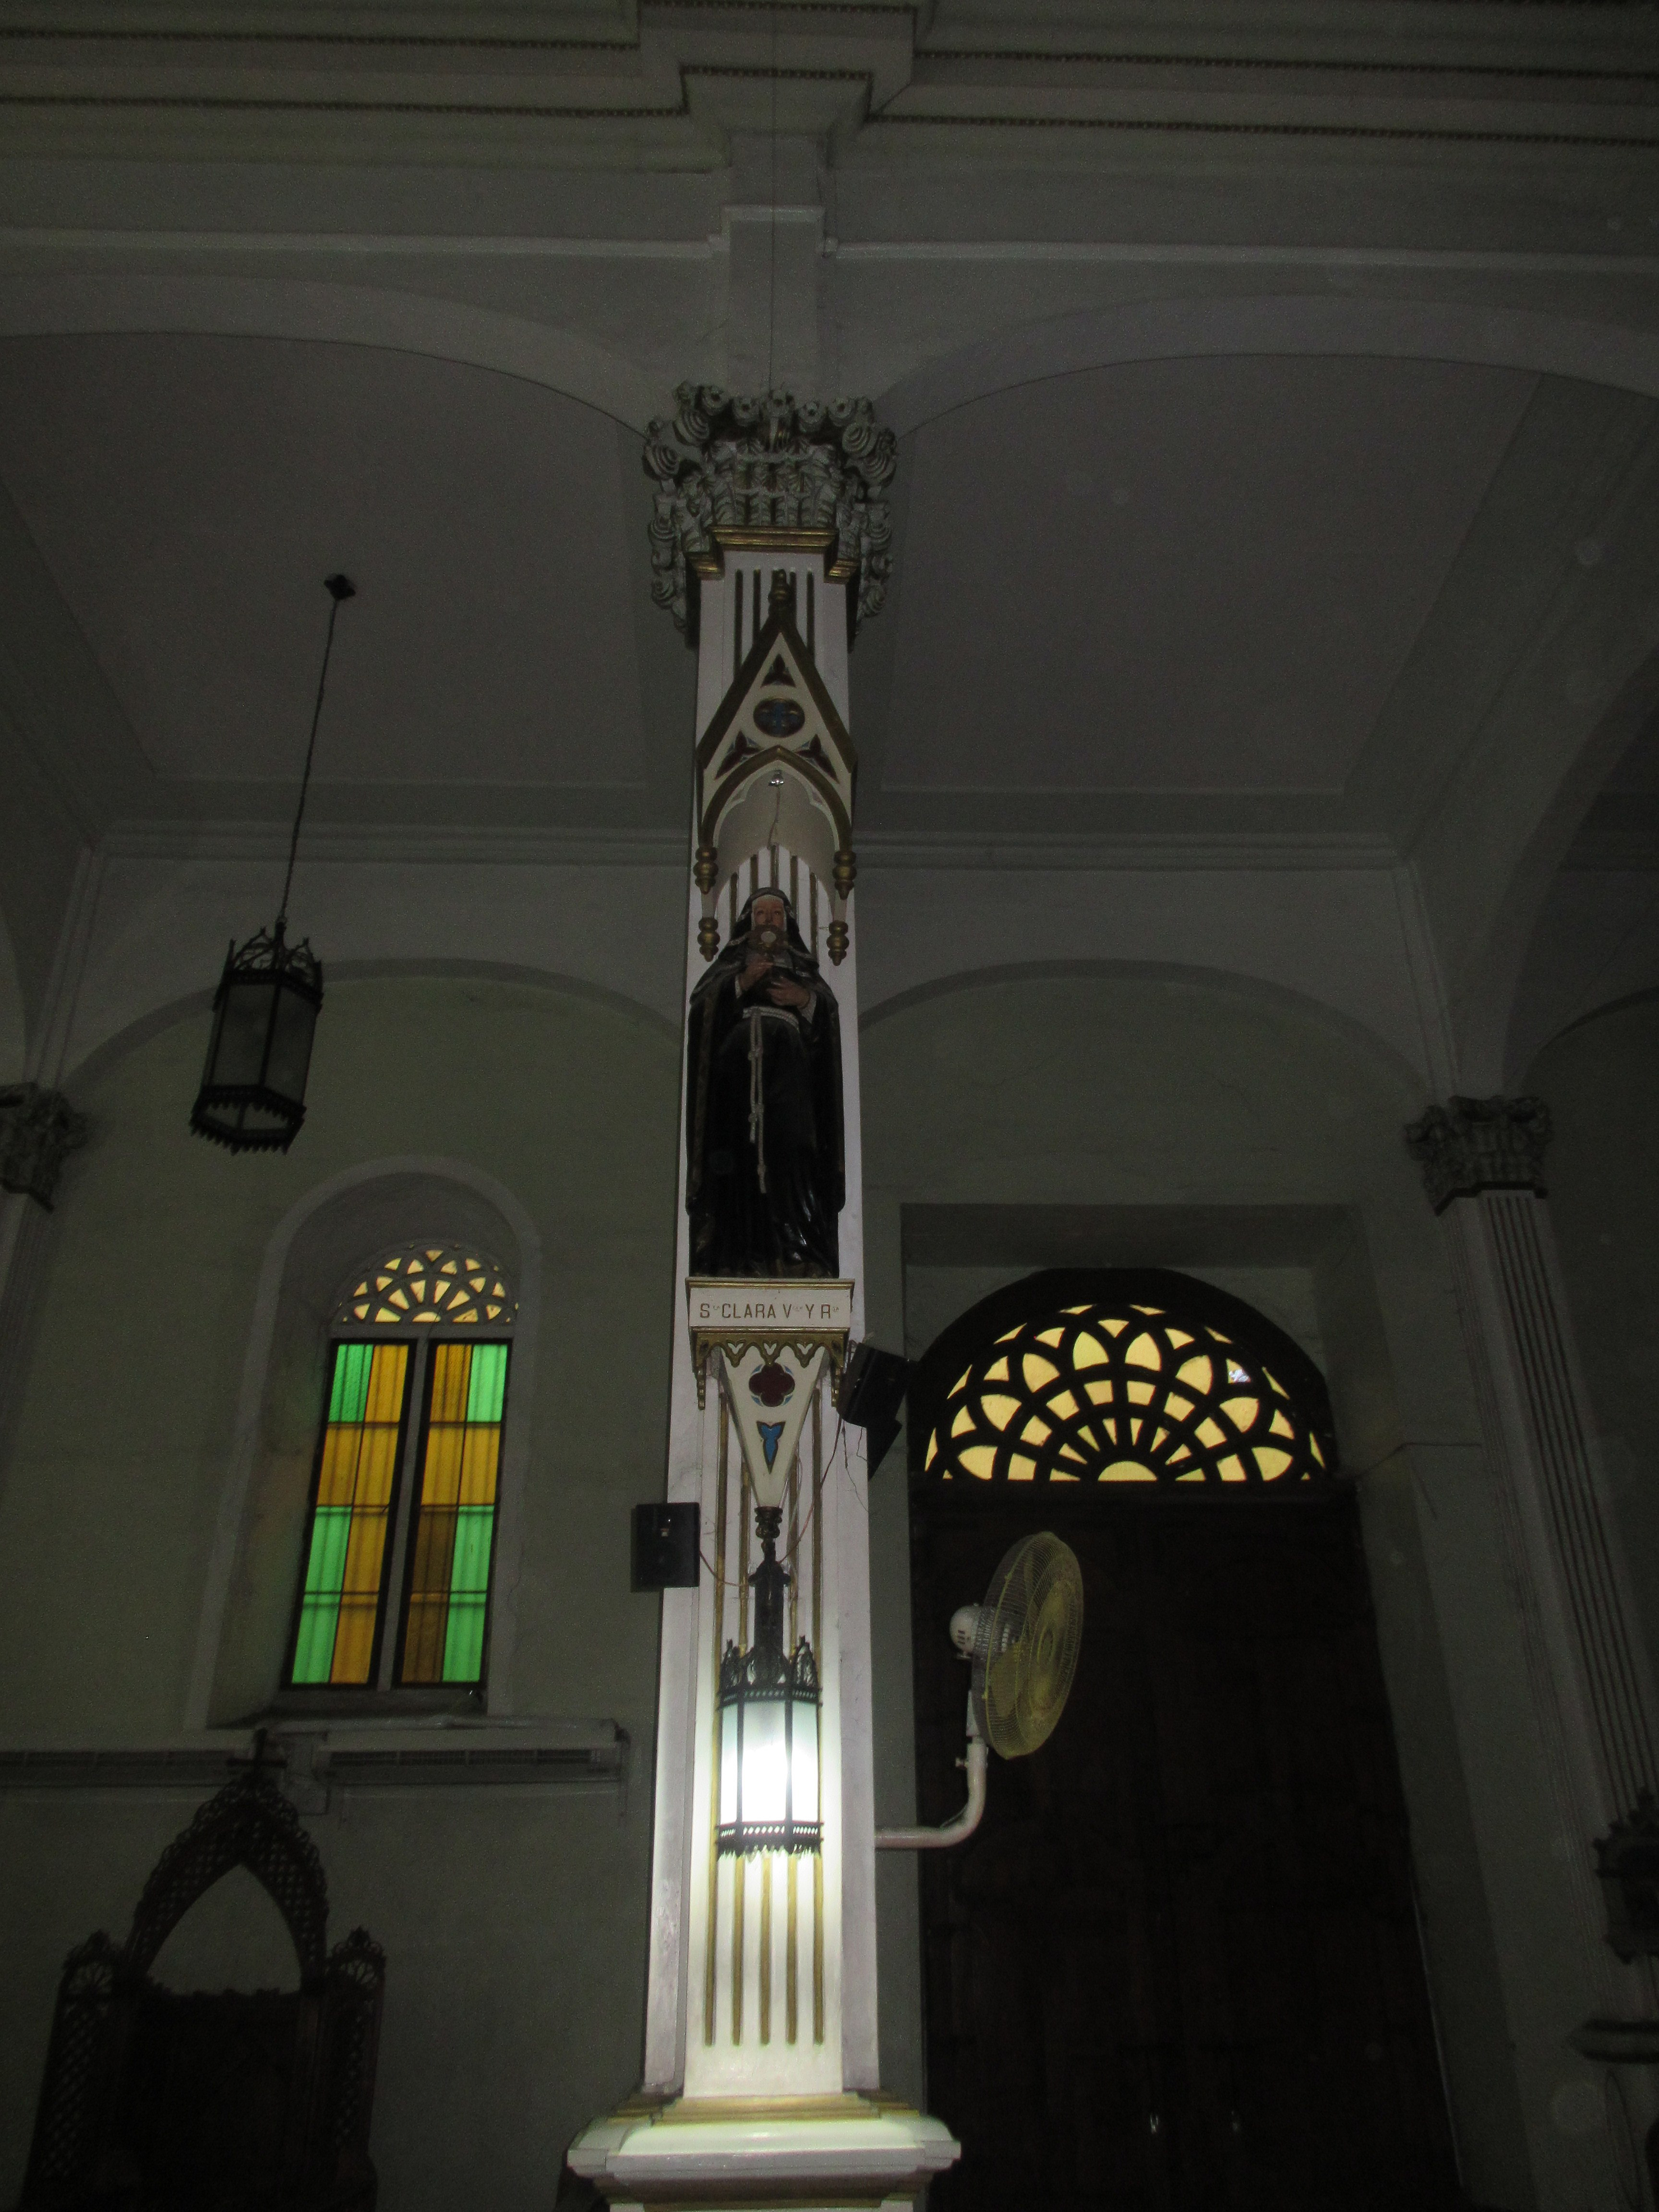 FILE MOLO CHURCH 004 JPG WIKIMEDIA COMMONS